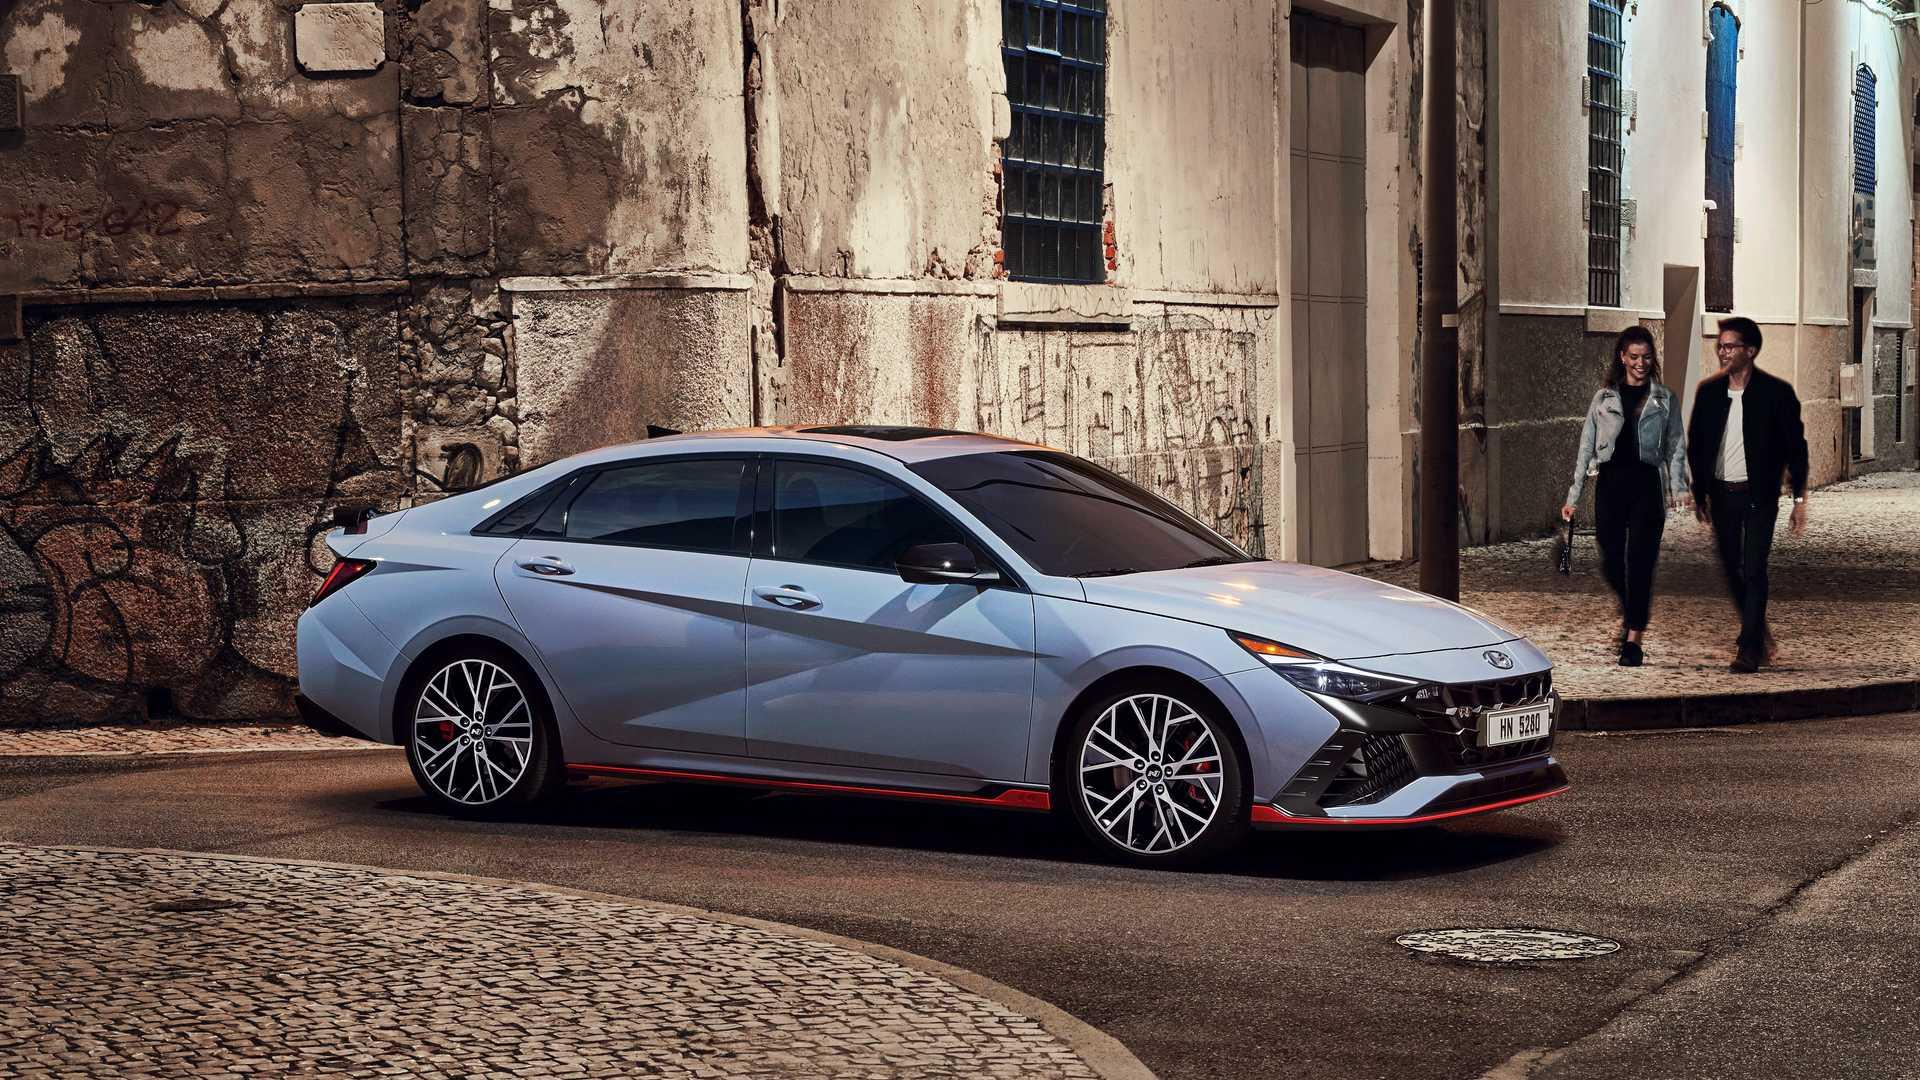 2022 Hyundai Elantra N Exterior